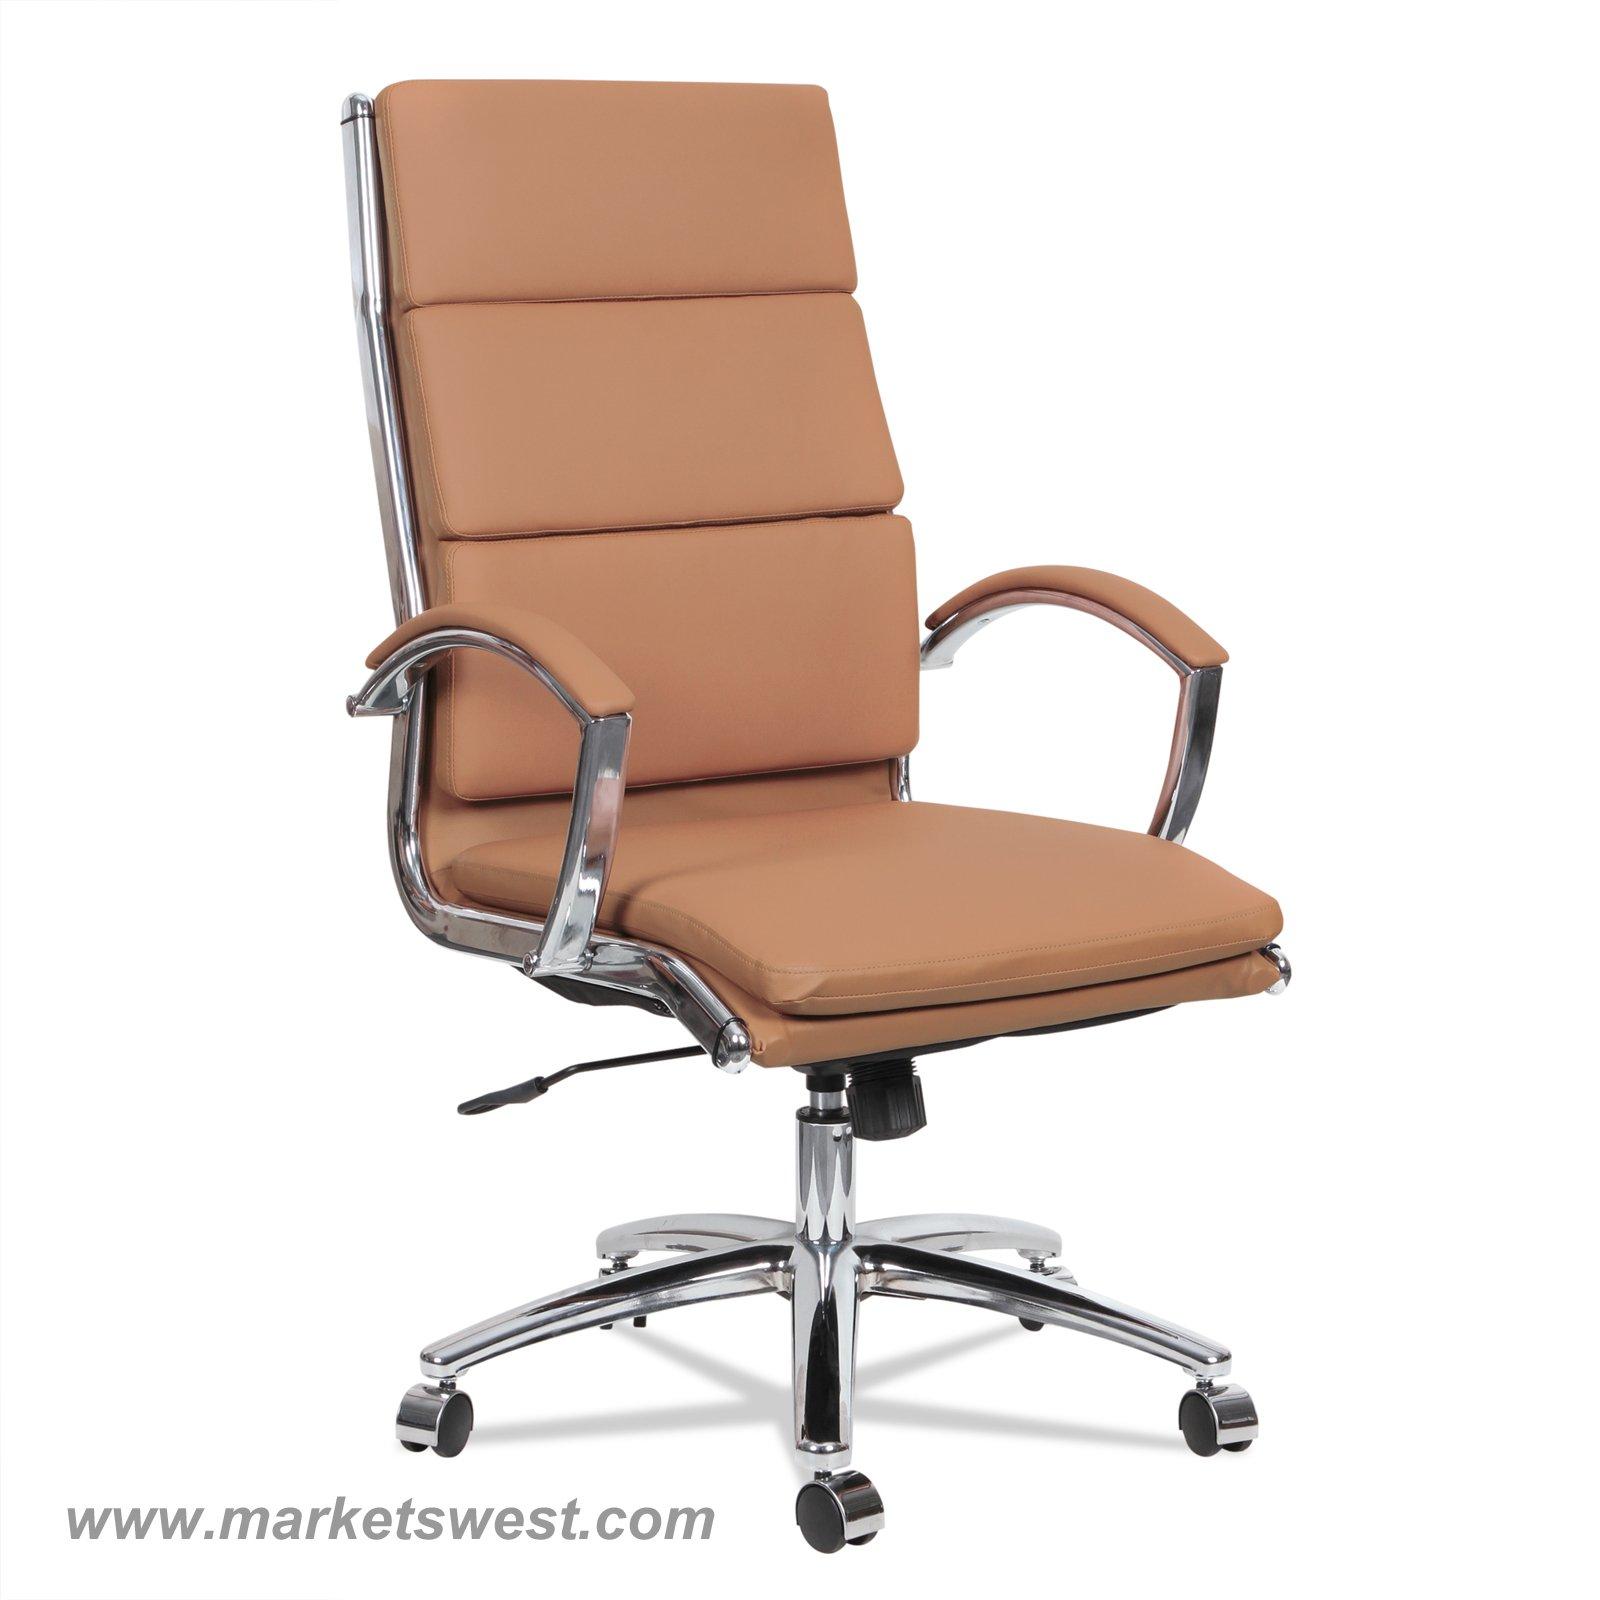 neratoli high back swivel tilt chair red soft touch leather chrome frame. Black Bedroom Furniture Sets. Home Design Ideas